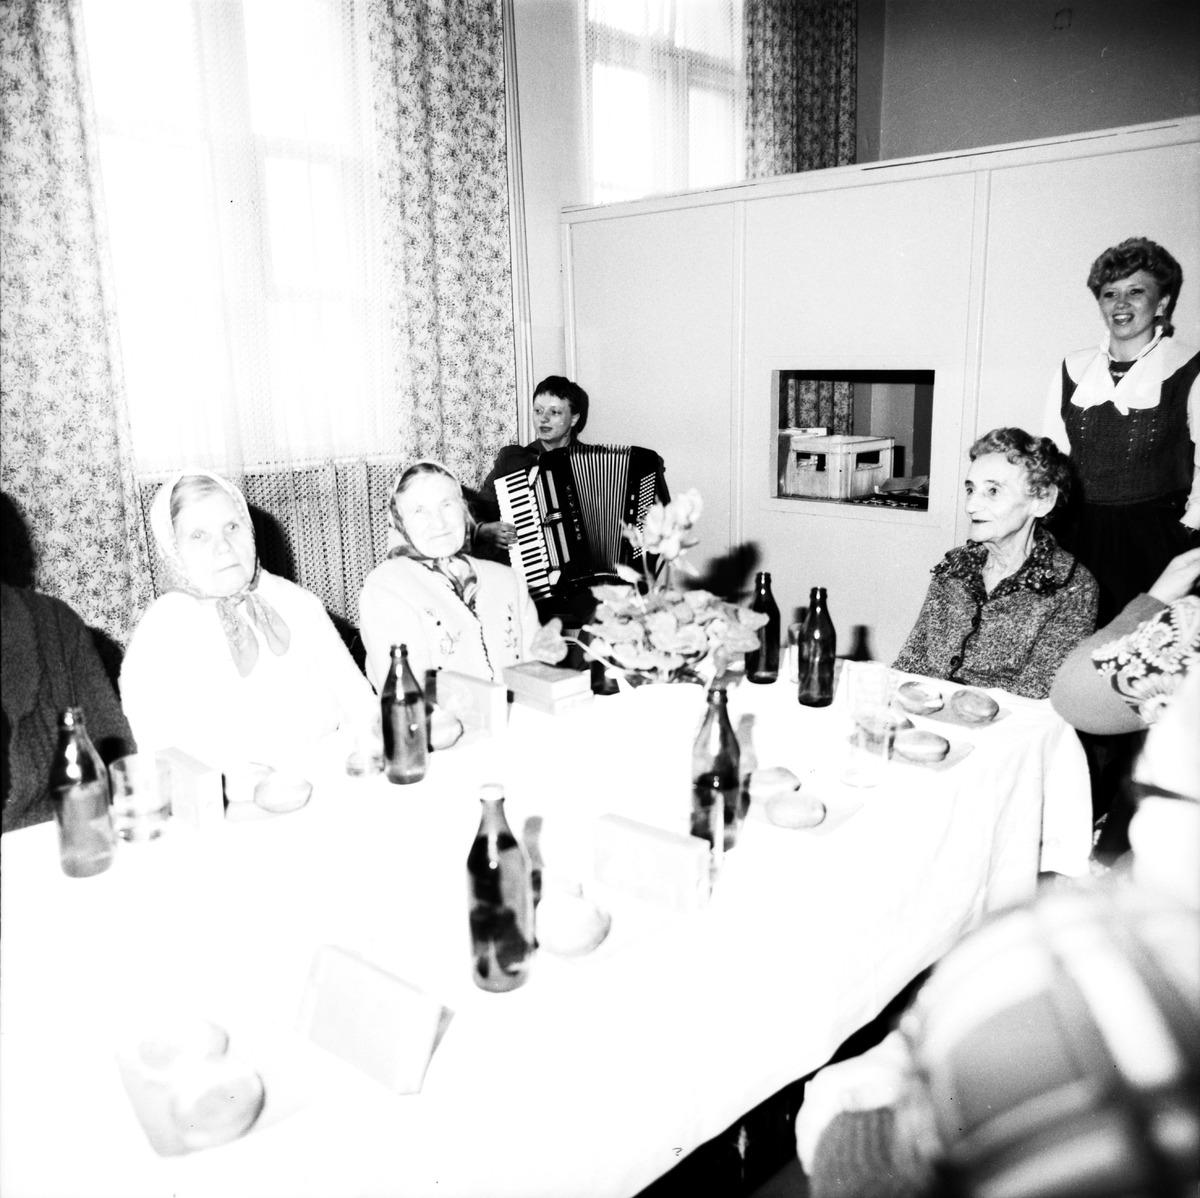 Obchody Dnia Seniora, 1986 r. [3]